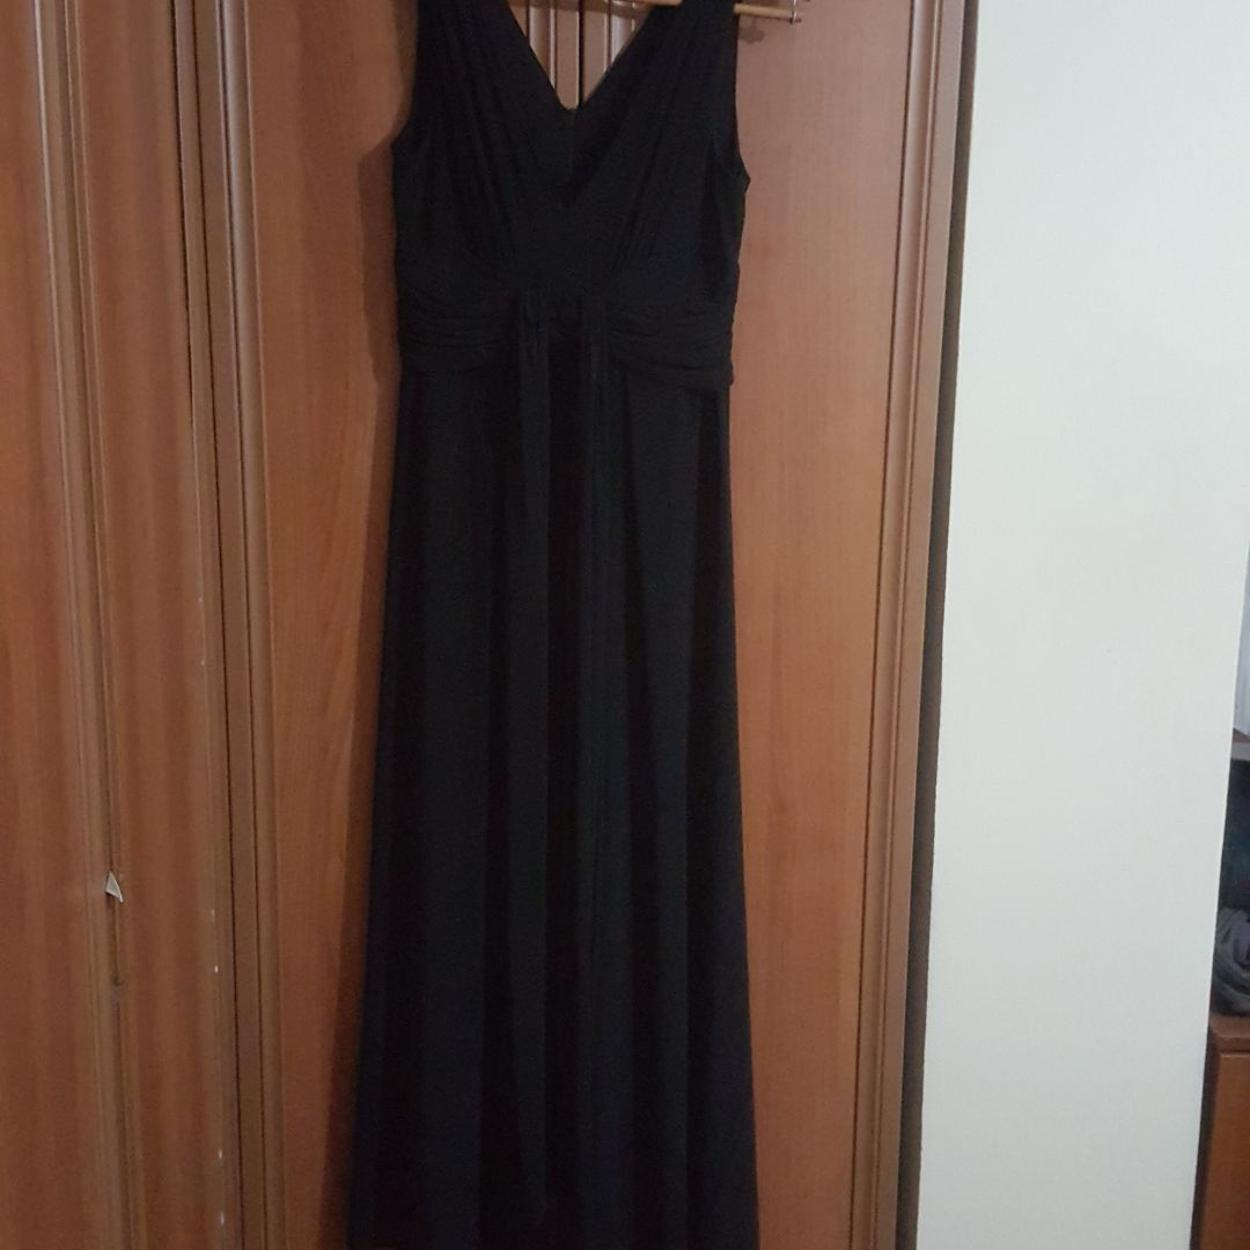 Belstaff Gece elbisesi